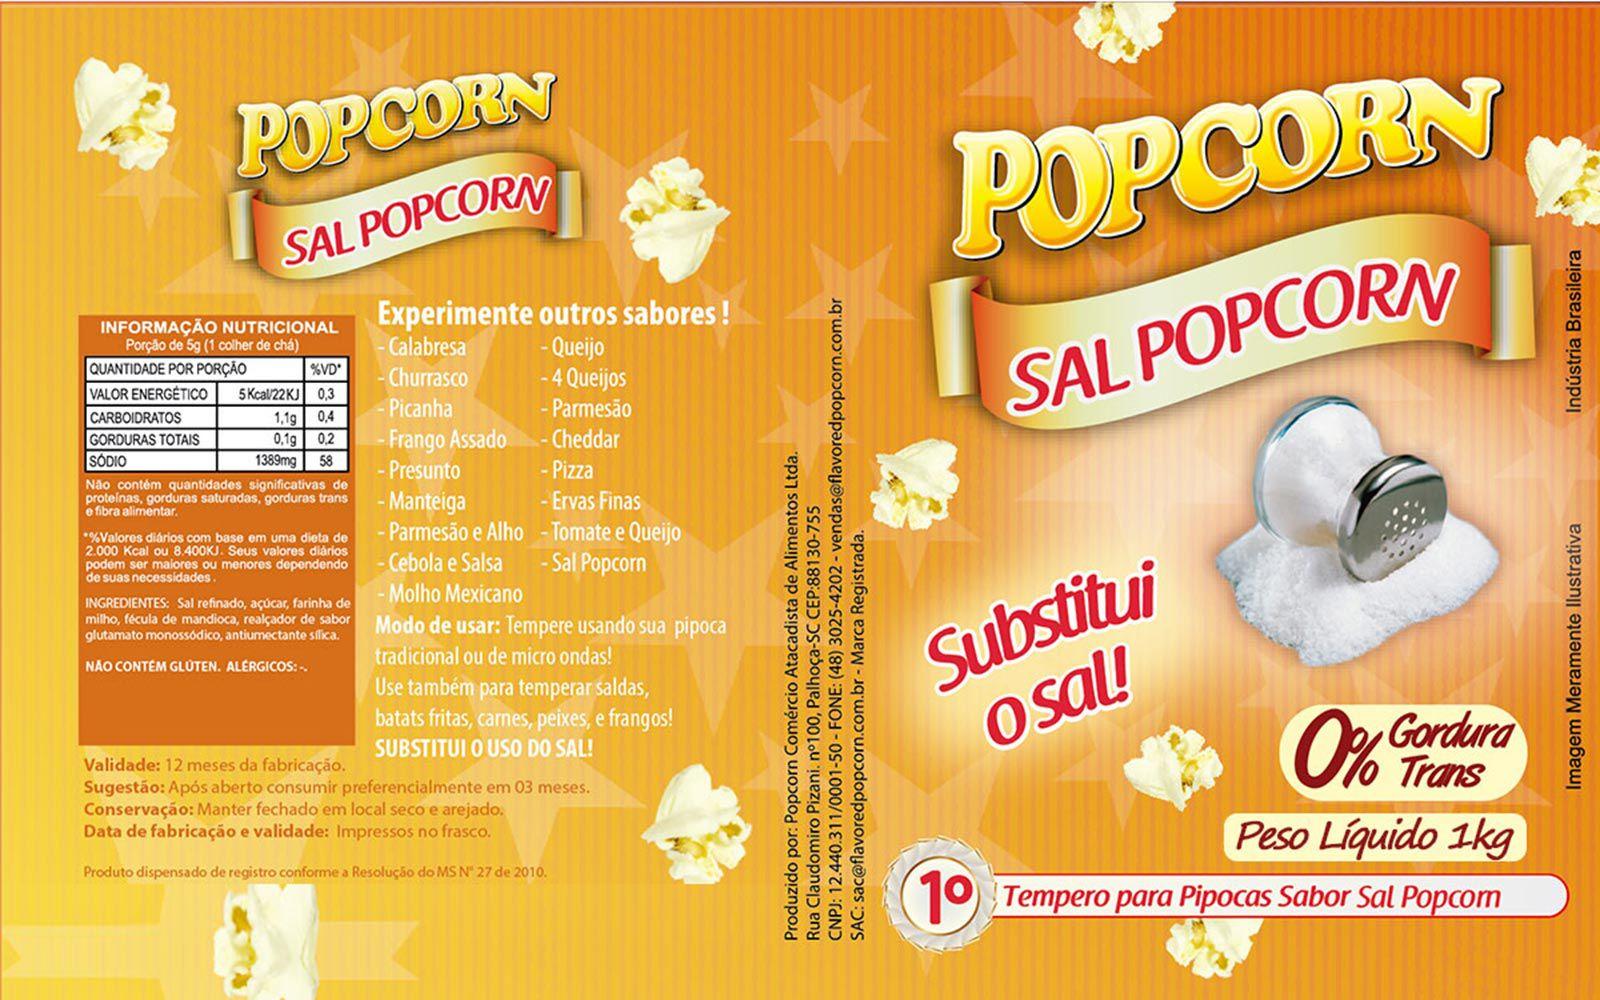 Tempero Pipoca Popcorn - Sabor Sal Popcorn - 1kg